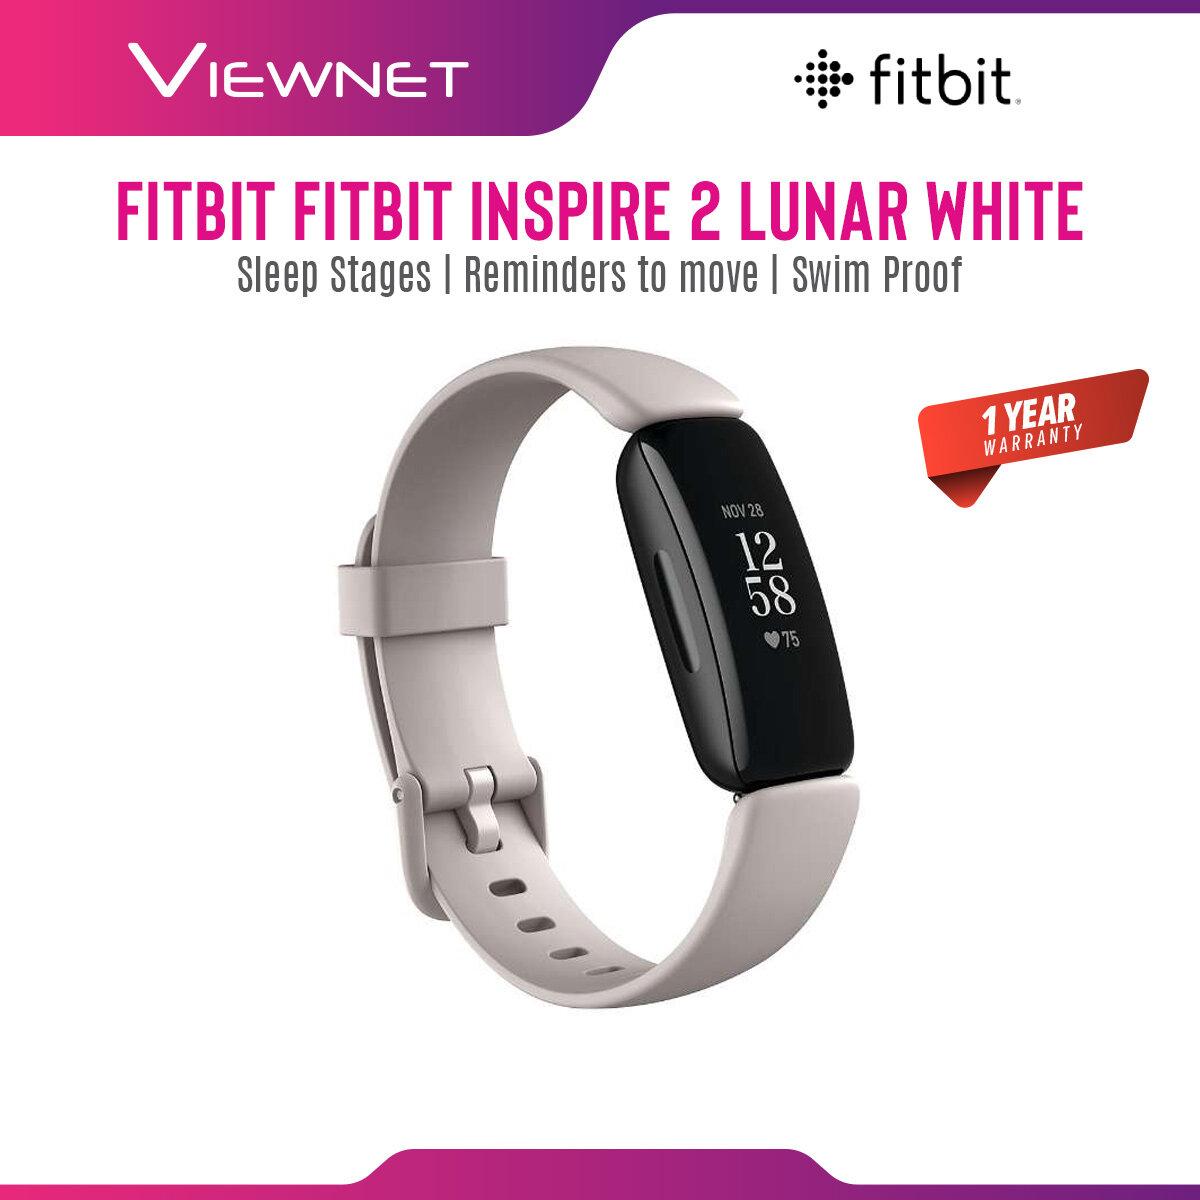 (NEW 2020) Fitbit Inspire 2 / Fitbit Inspire HR Smart Fitness Smartwatch (Fitbit Inspire HR Black/White Black/Lilac)  (Fitbit Inspire 2 Black/Desert Rose/Lunar White)